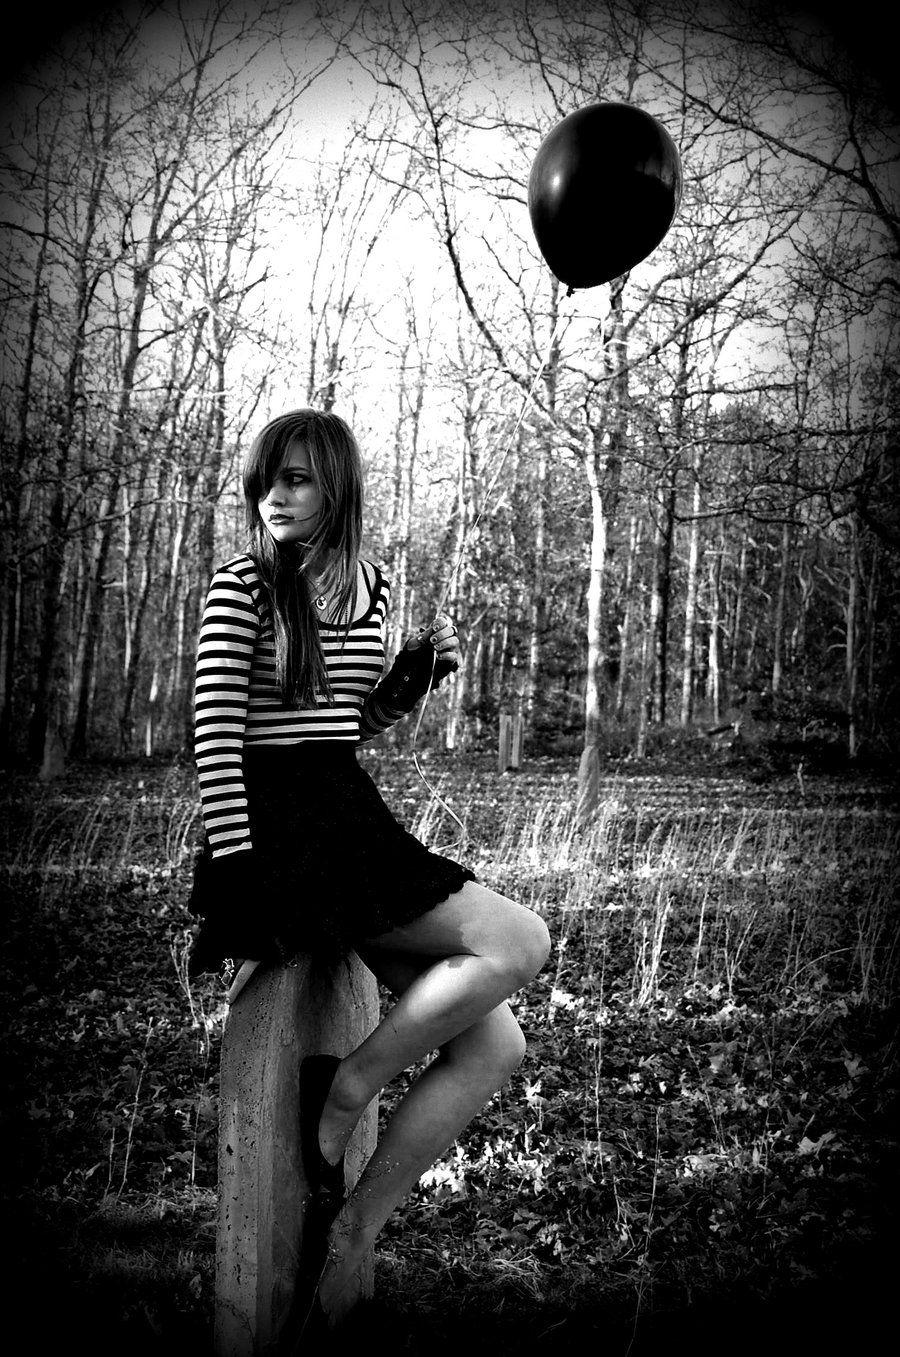 000 farewell my black balloon by oceansided Black balloons